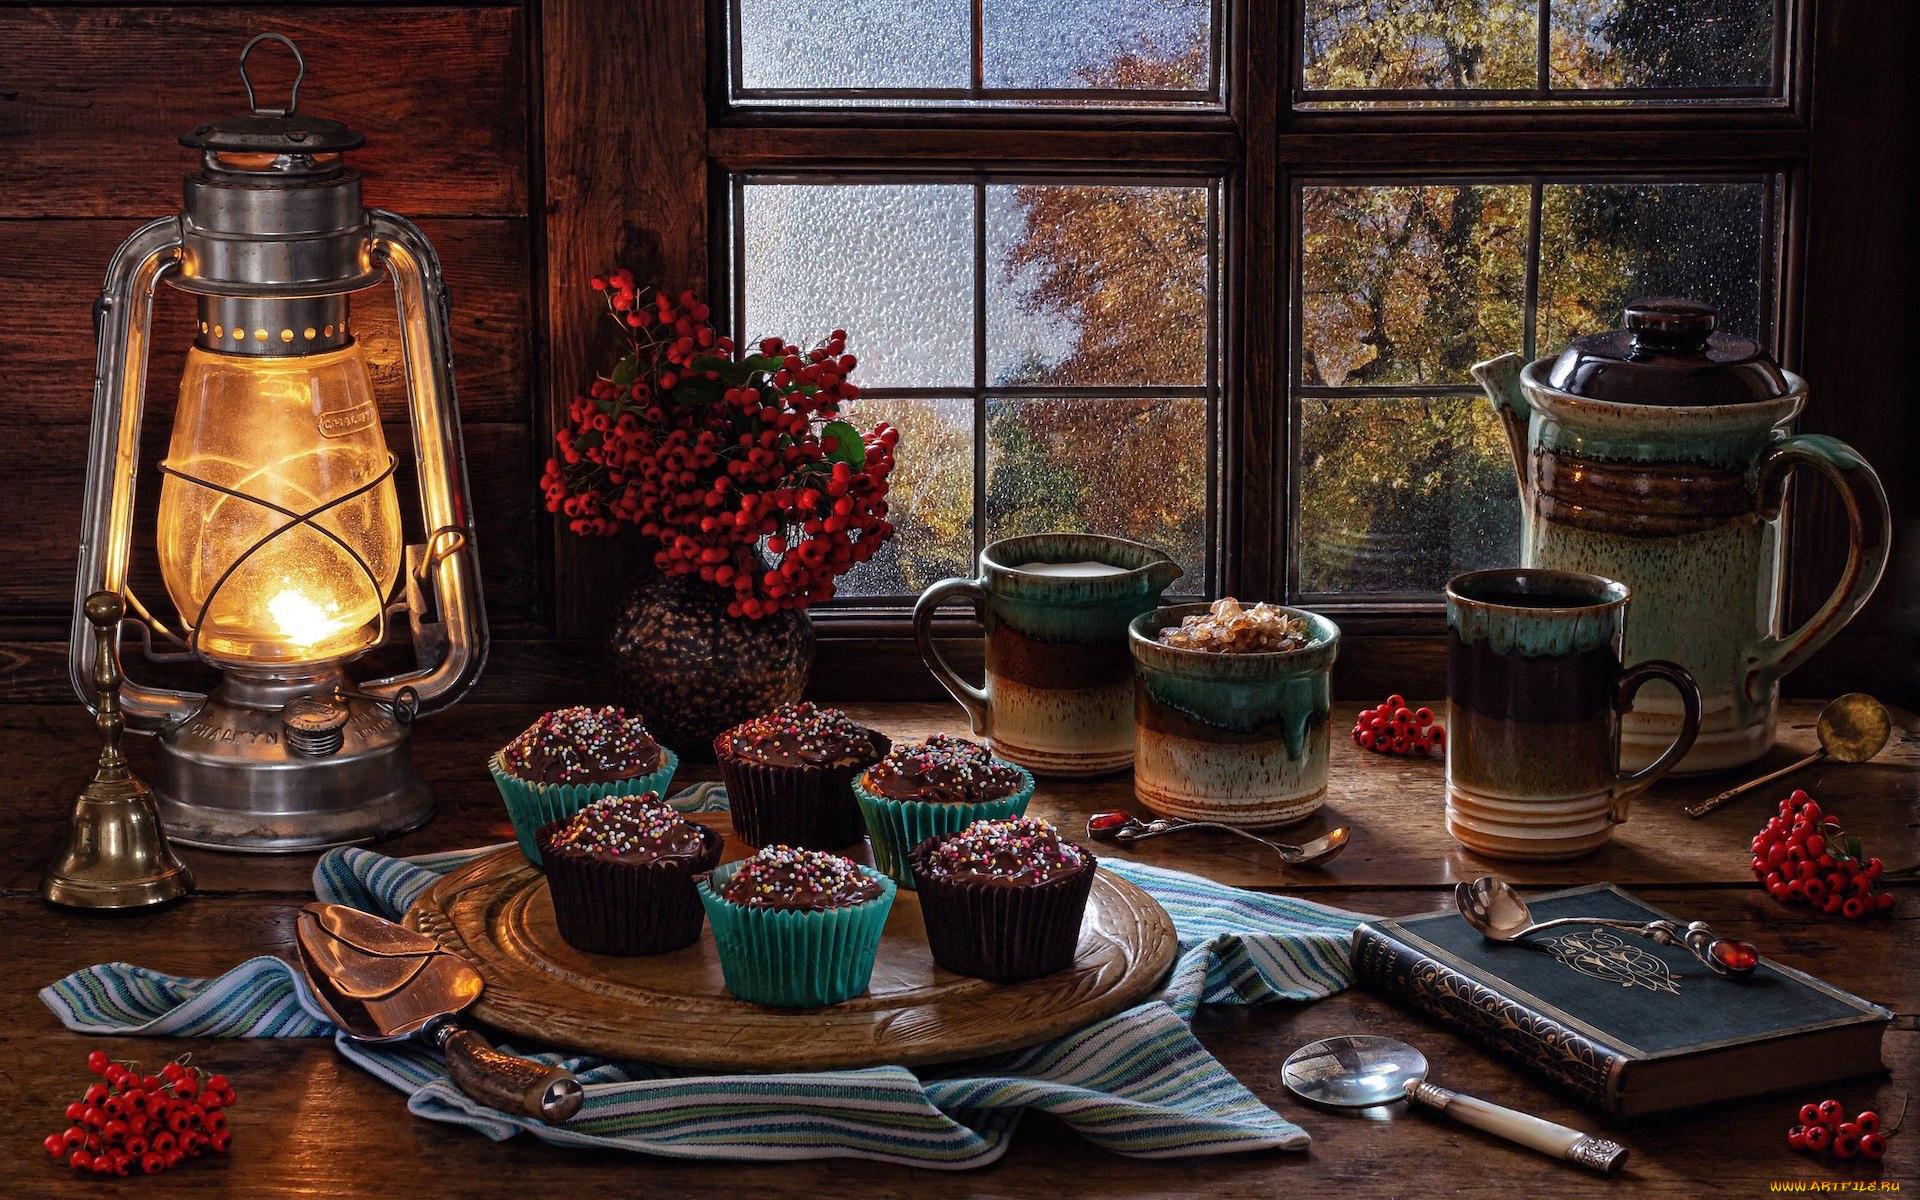 еда, натюрморт, рябина, лампа, книга, кексы